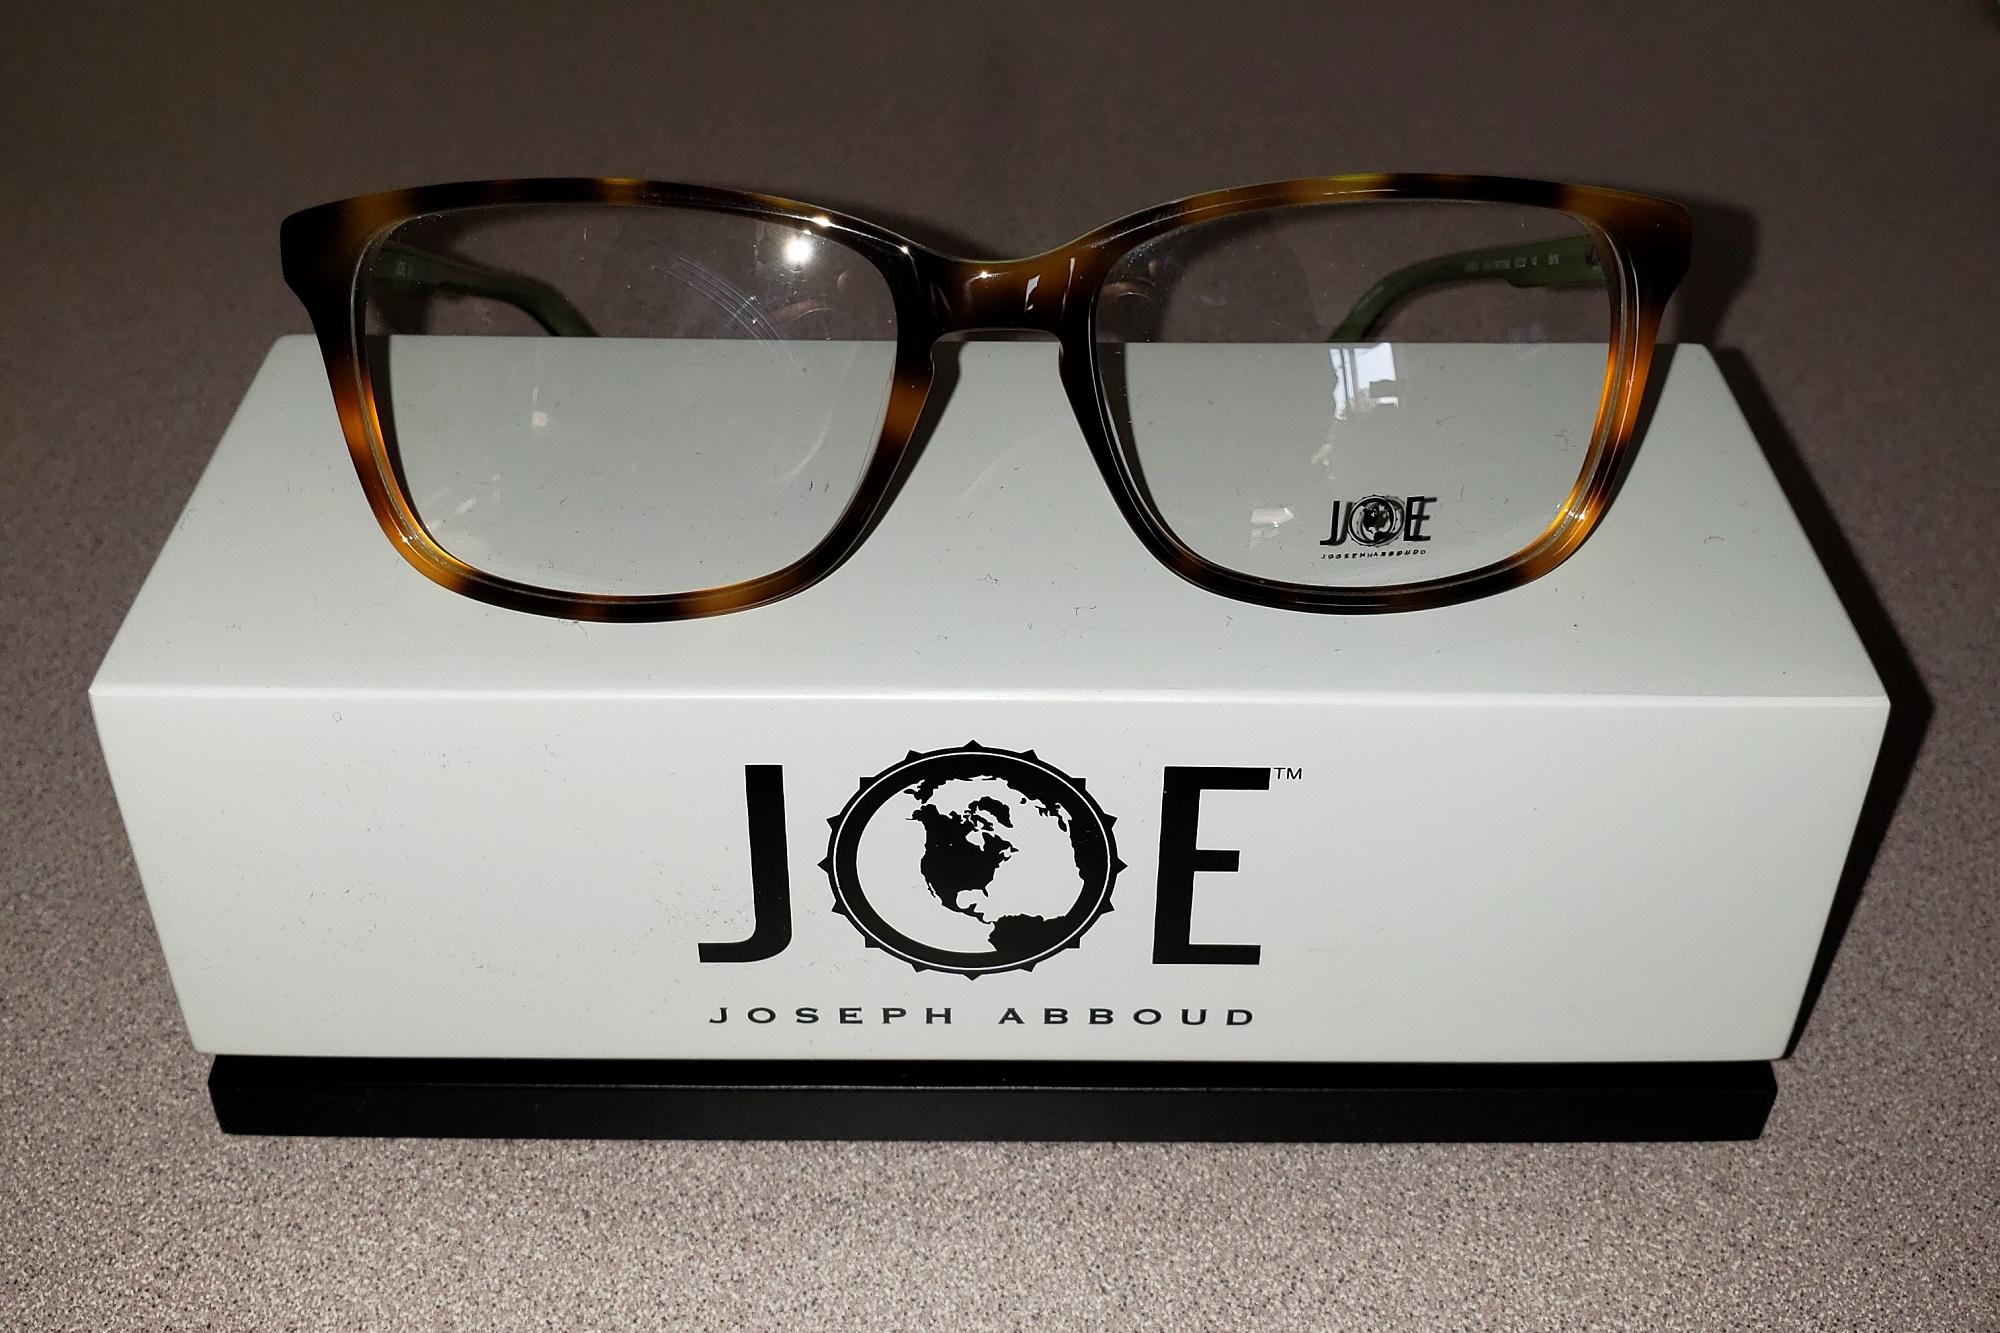 Joe eyeglass display